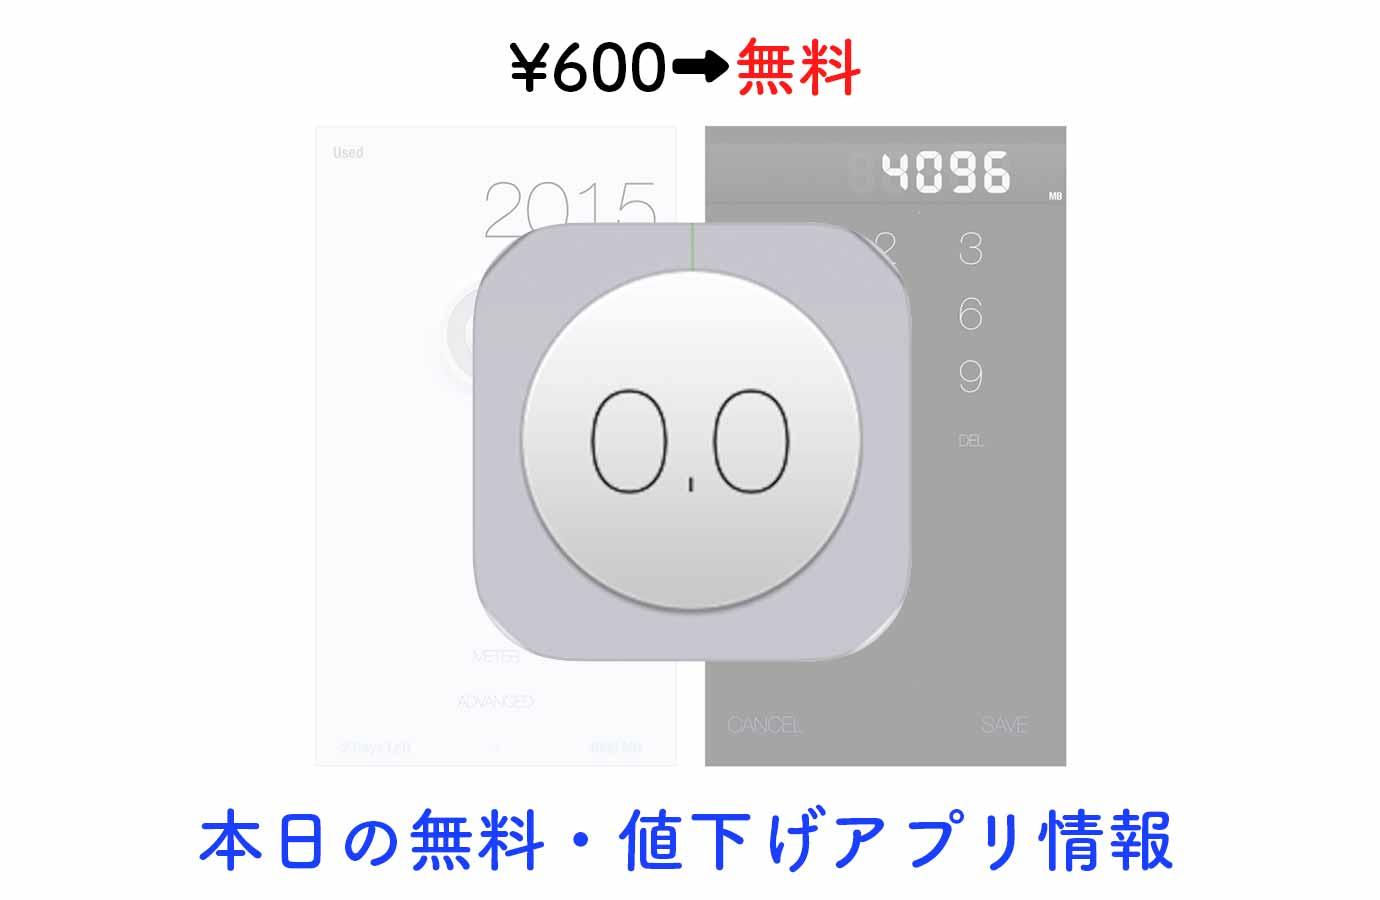 Appsale0827